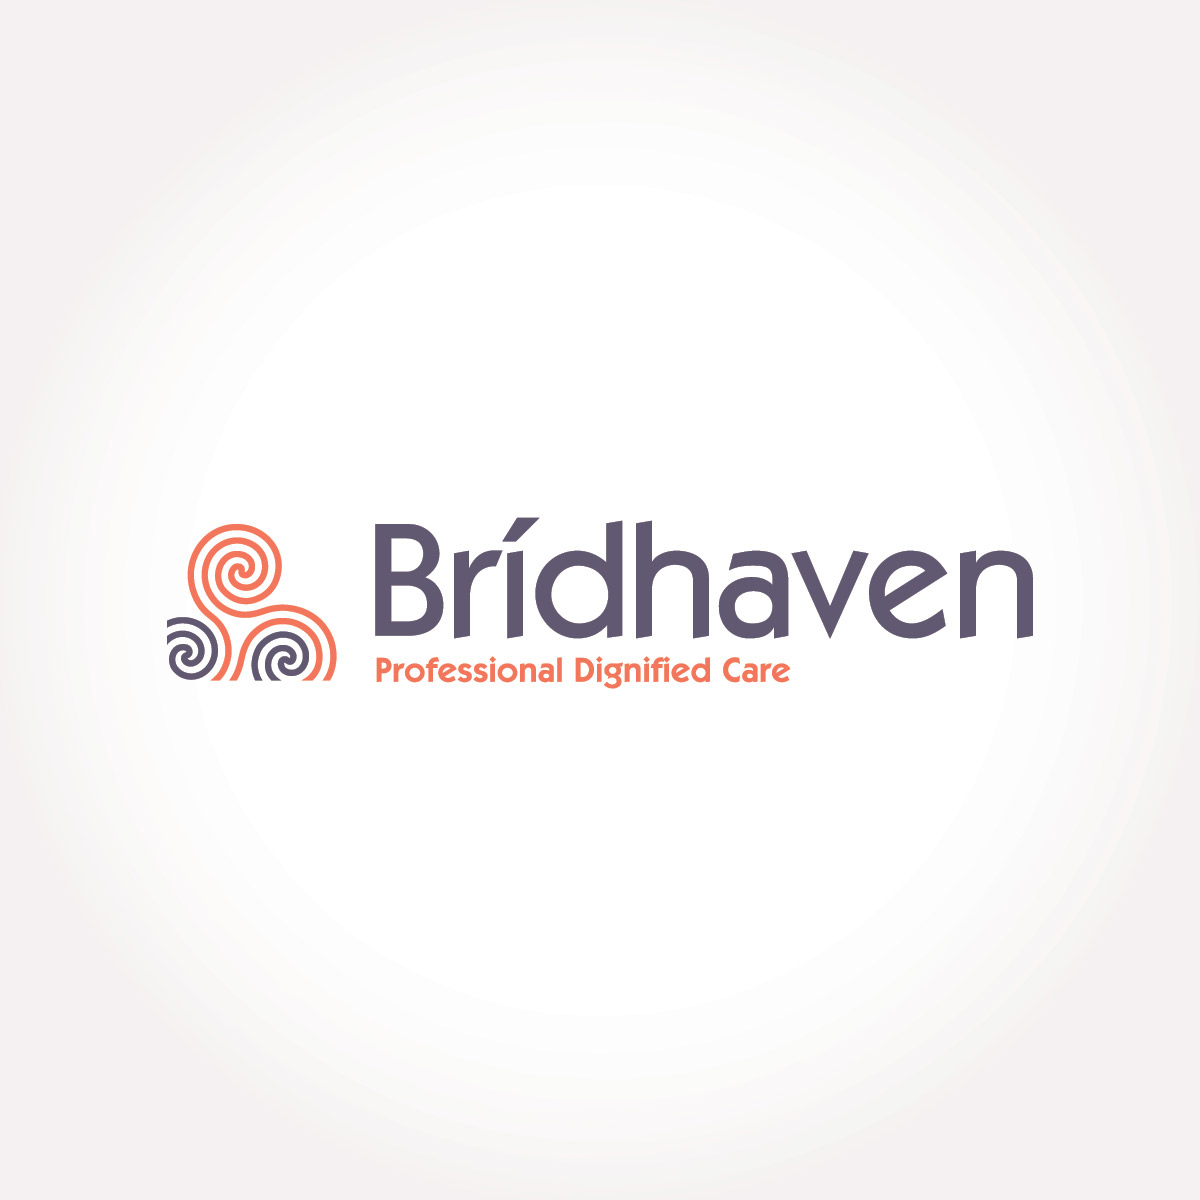 Bridhaven_Logo.jpg